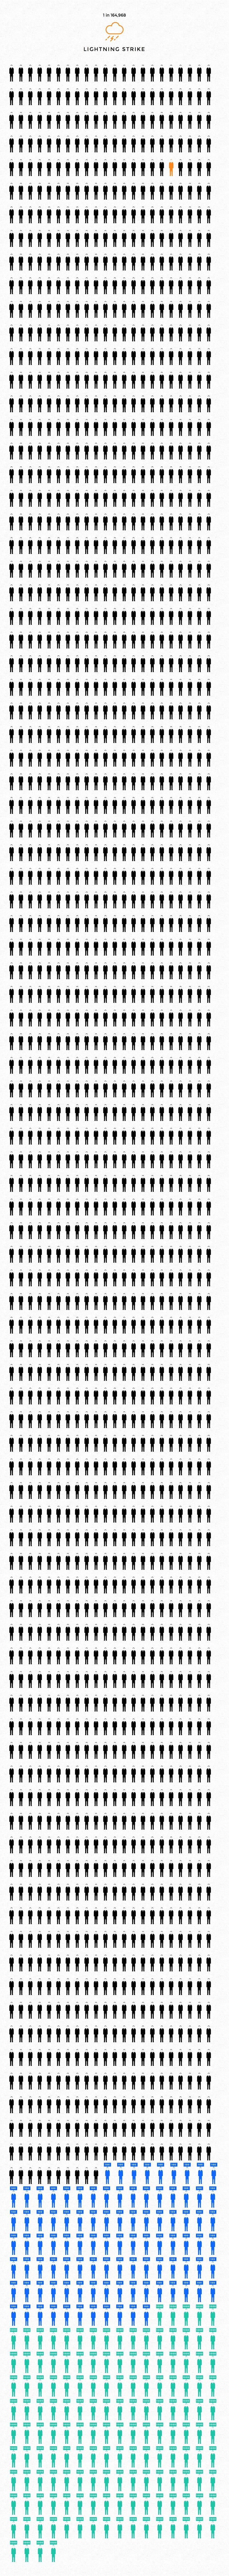 death-infographic12